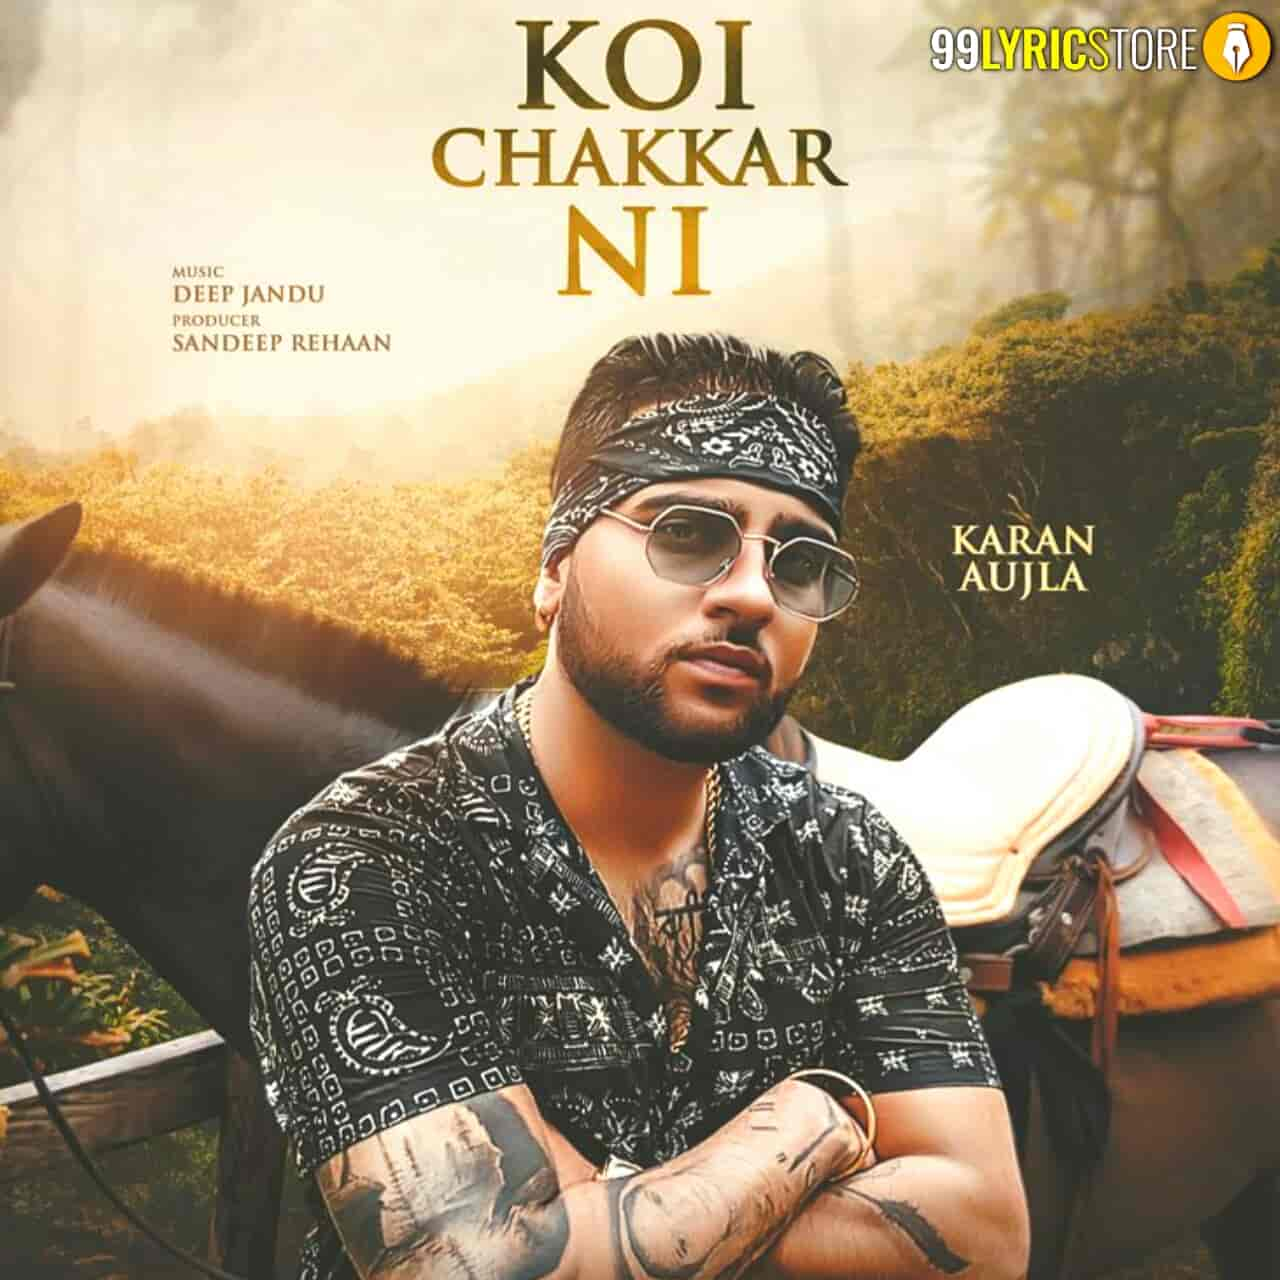 Koi Chakkar Ni Punjabi Song Sung By Karan Aujla